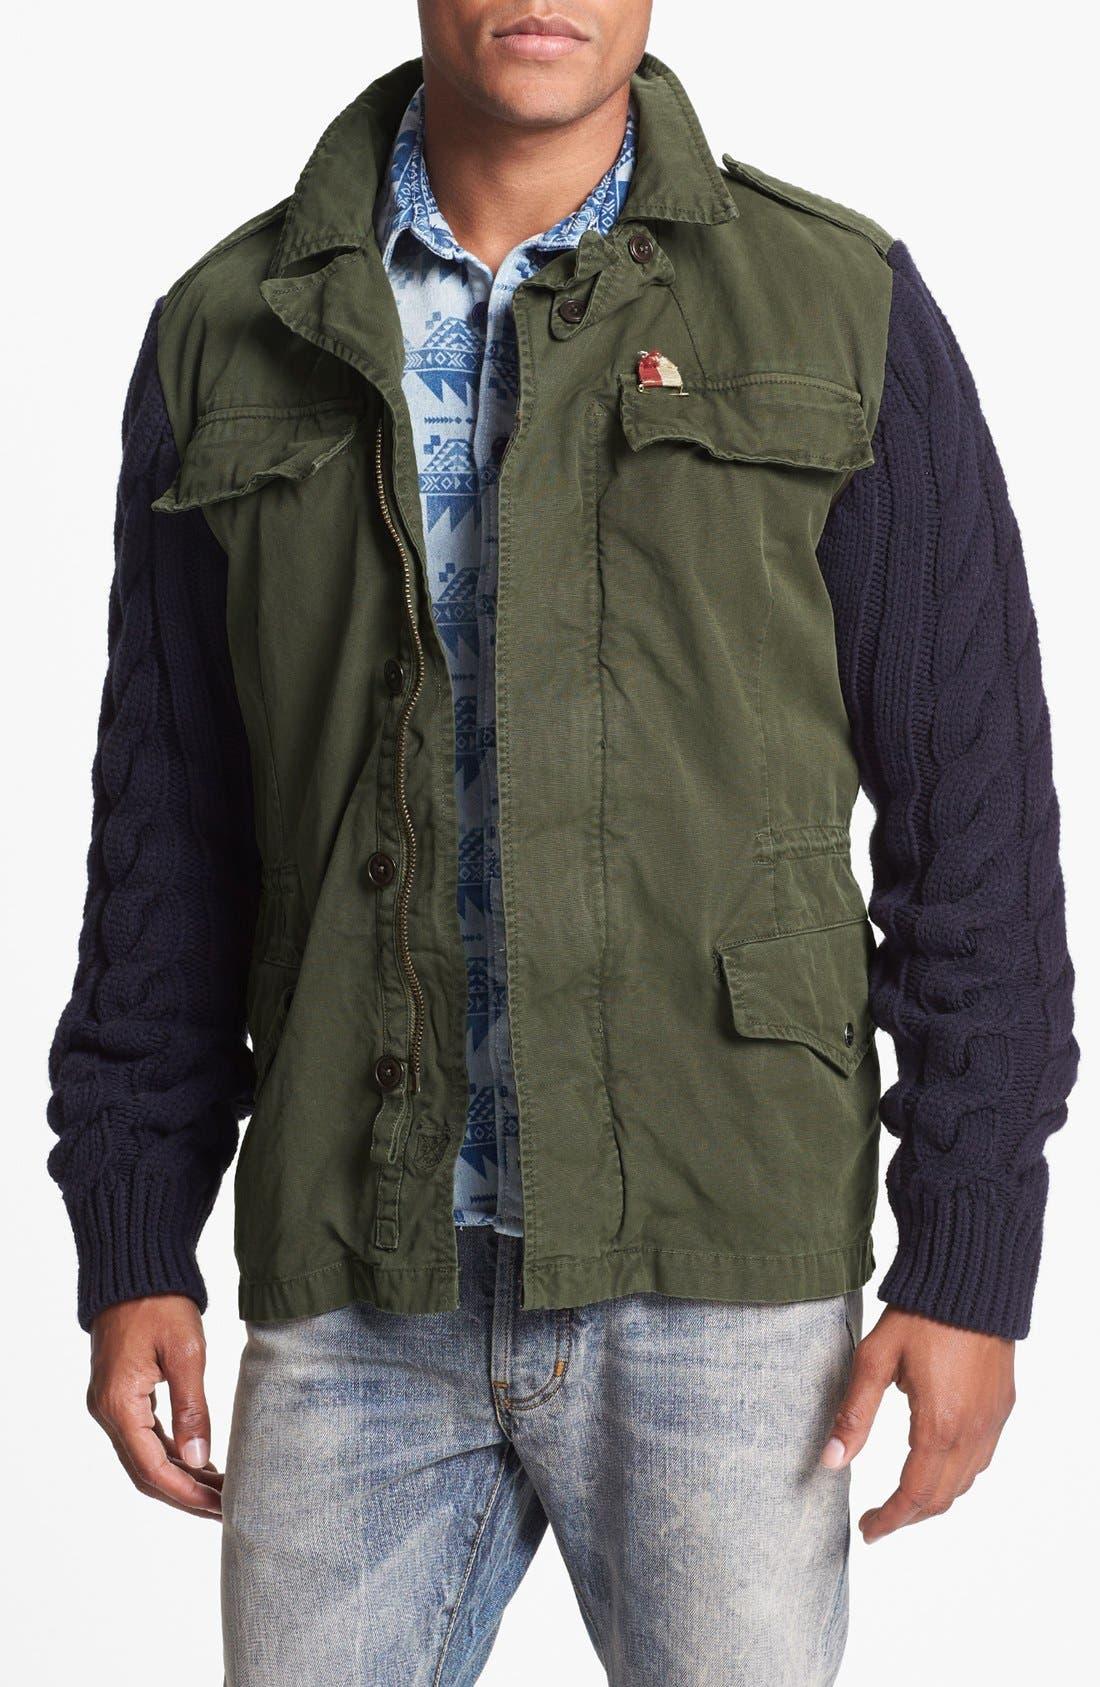 Main Image - Scotch & Soda Military Jacket with Knit Sleeves